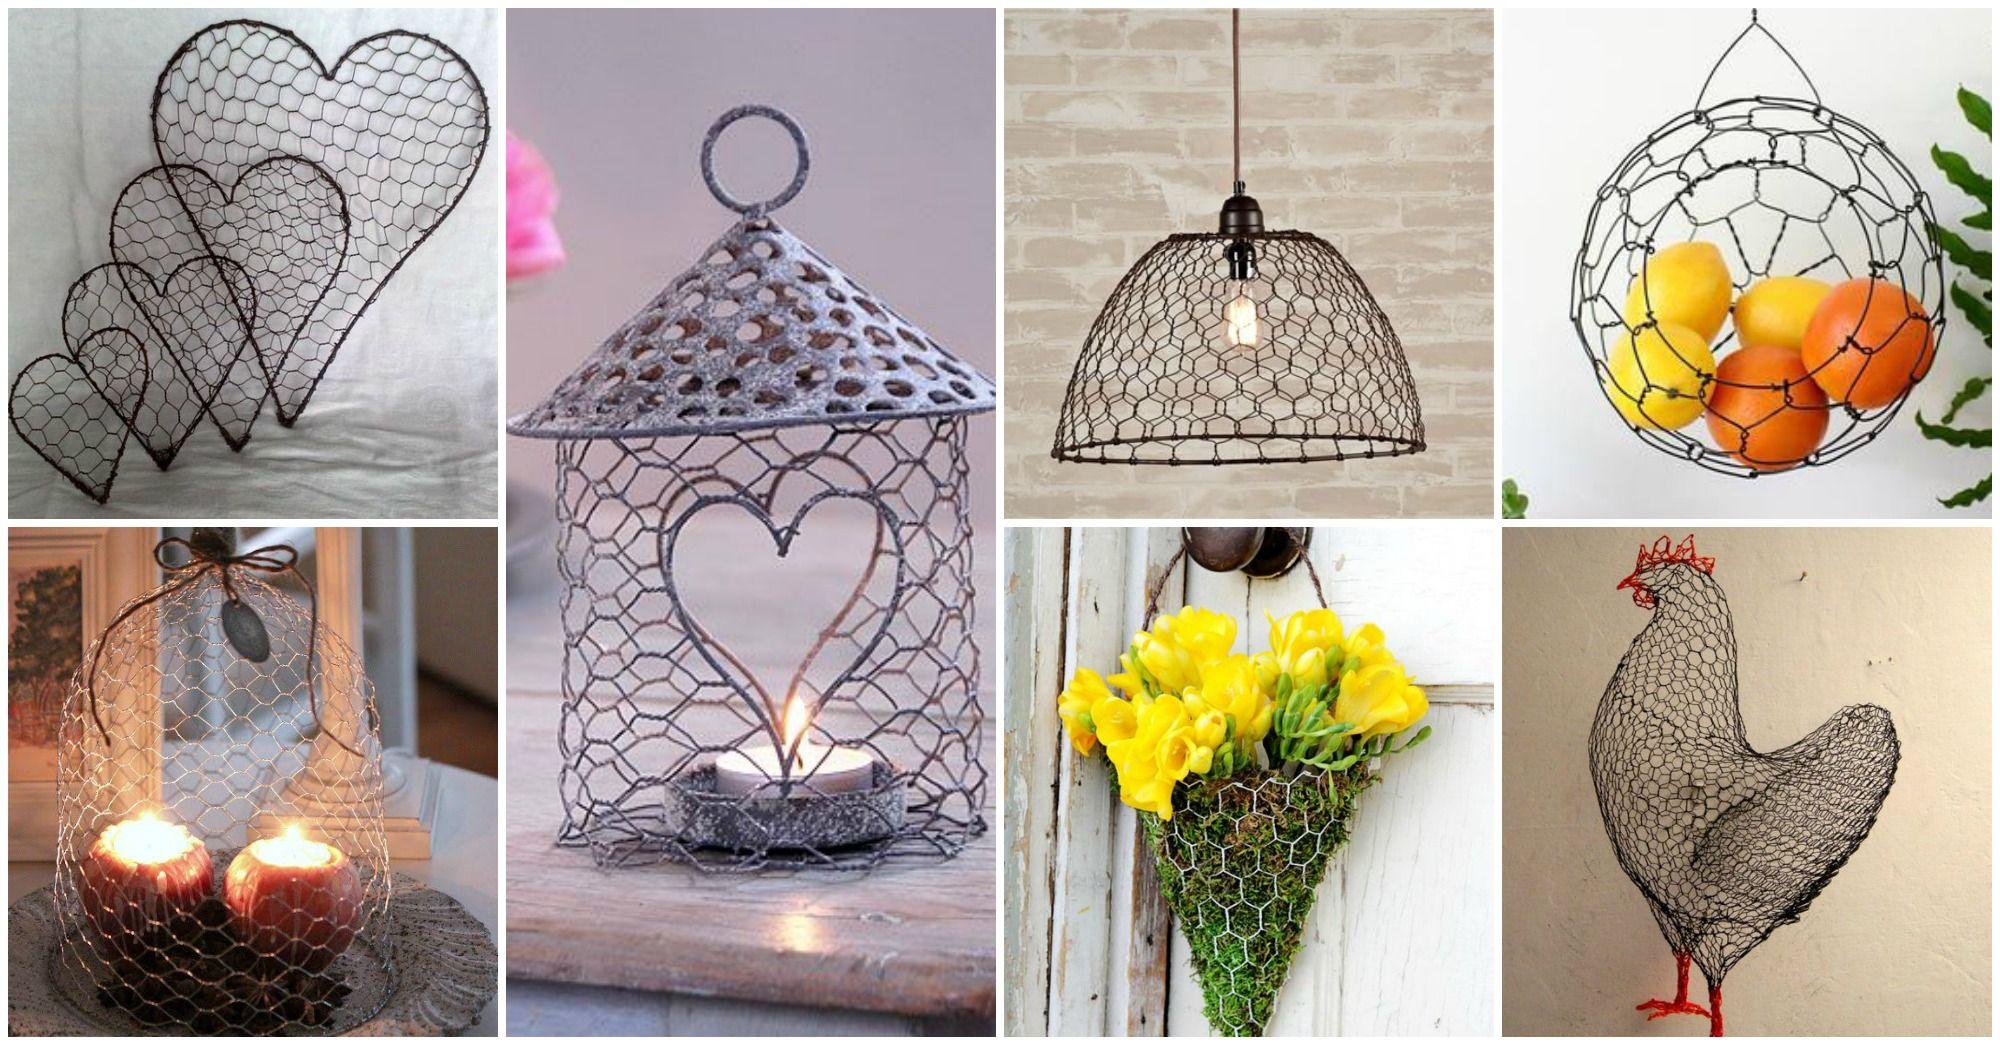 chicken wire crafts | Hasendraht Deko | Pinterest | Hasendraht ...